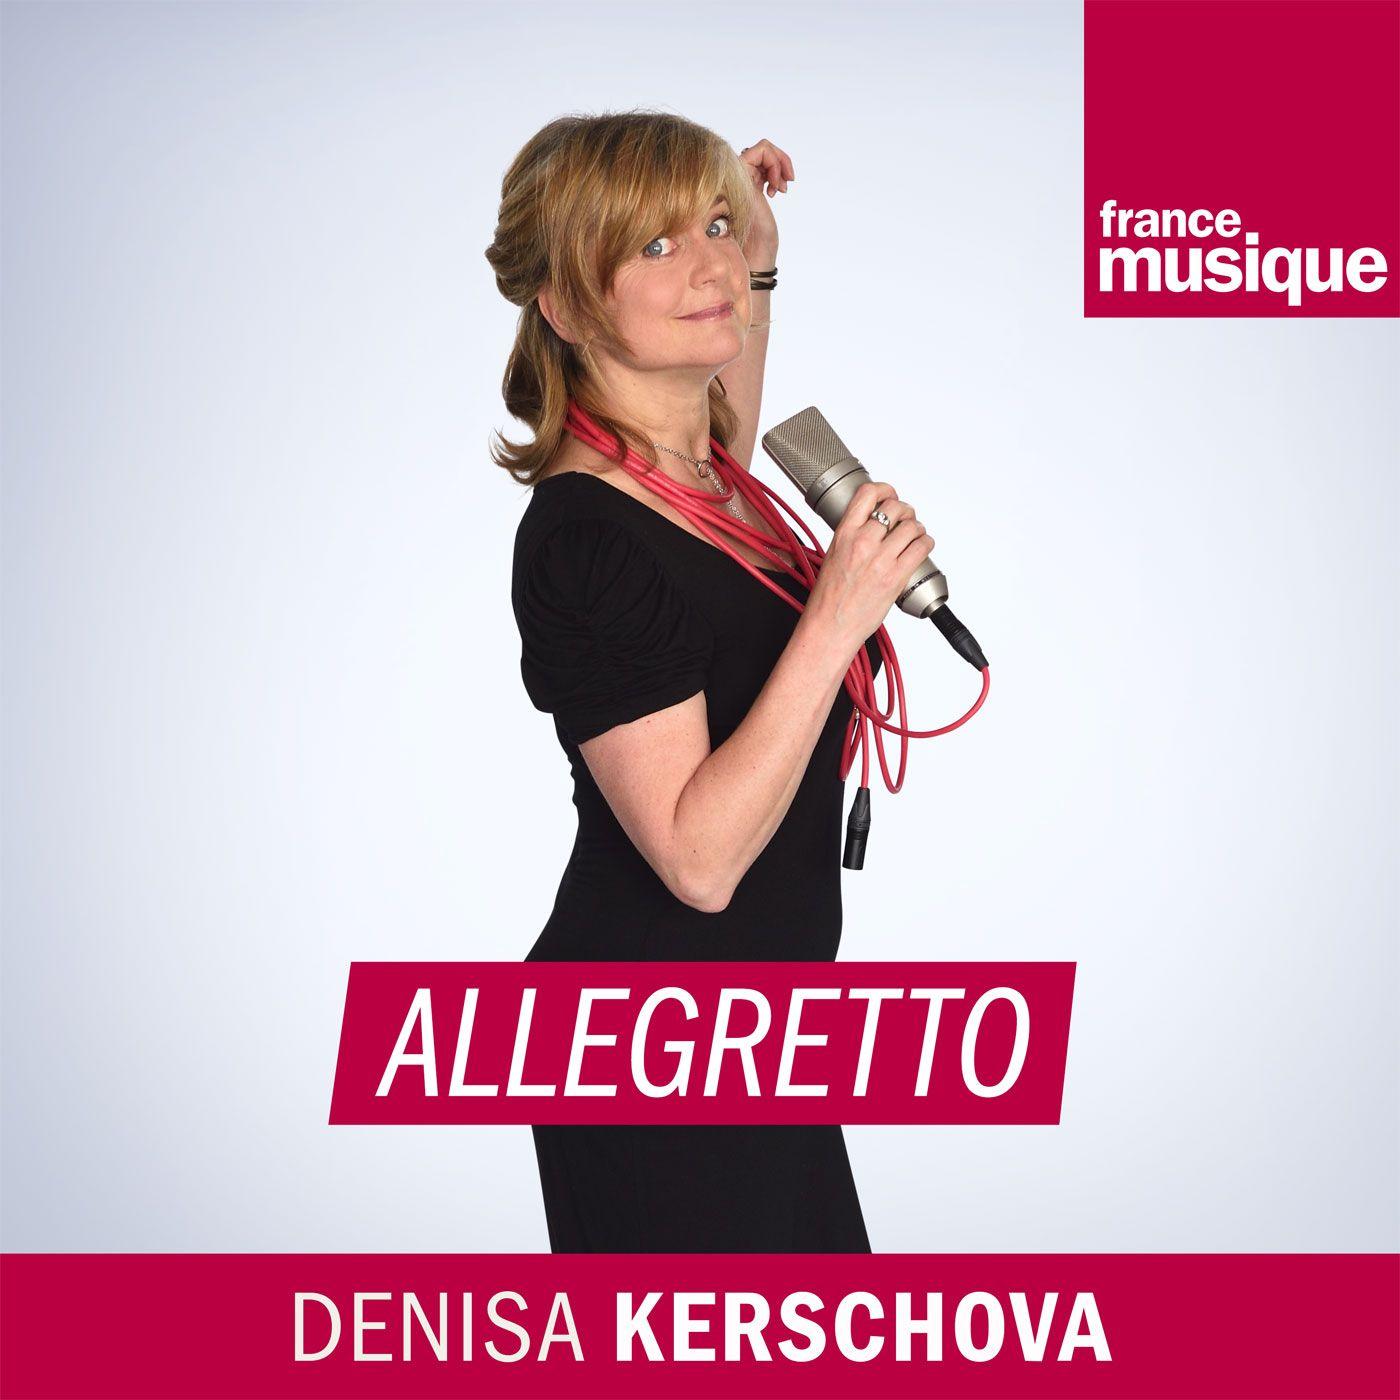 Image 1: Allegretto programme musical de Denisa Kerschova